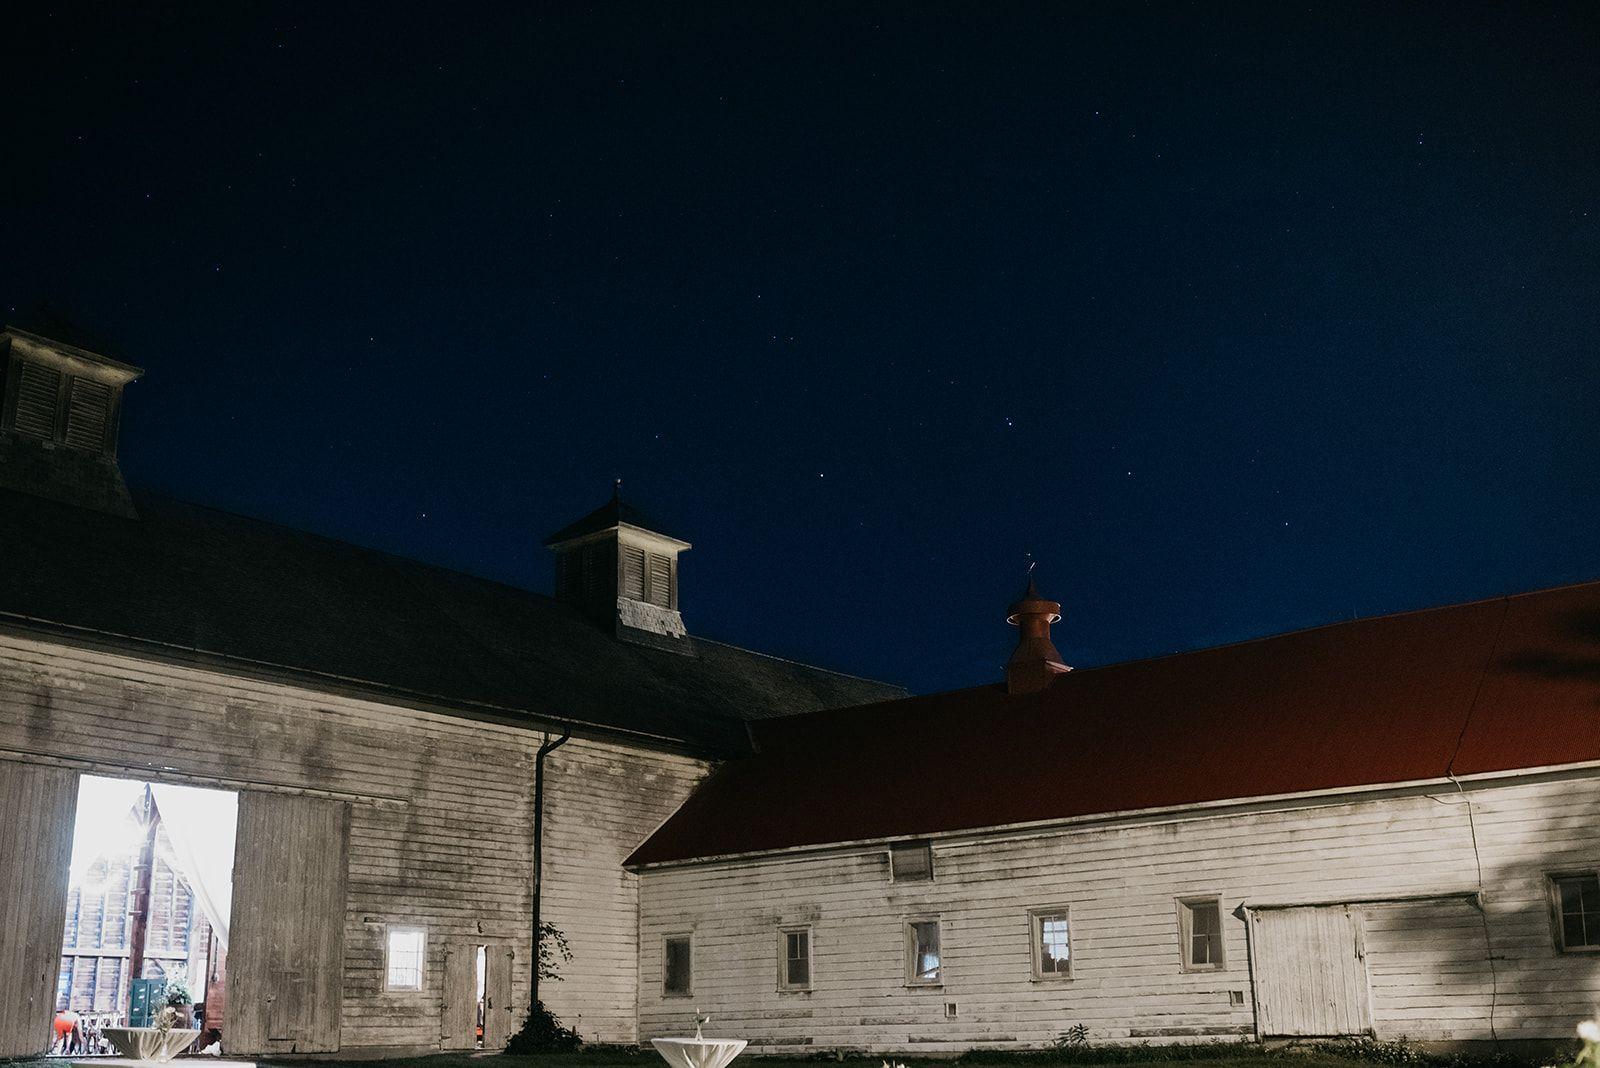 Shaker Heritage Barn Photos by Andrew Franciosa